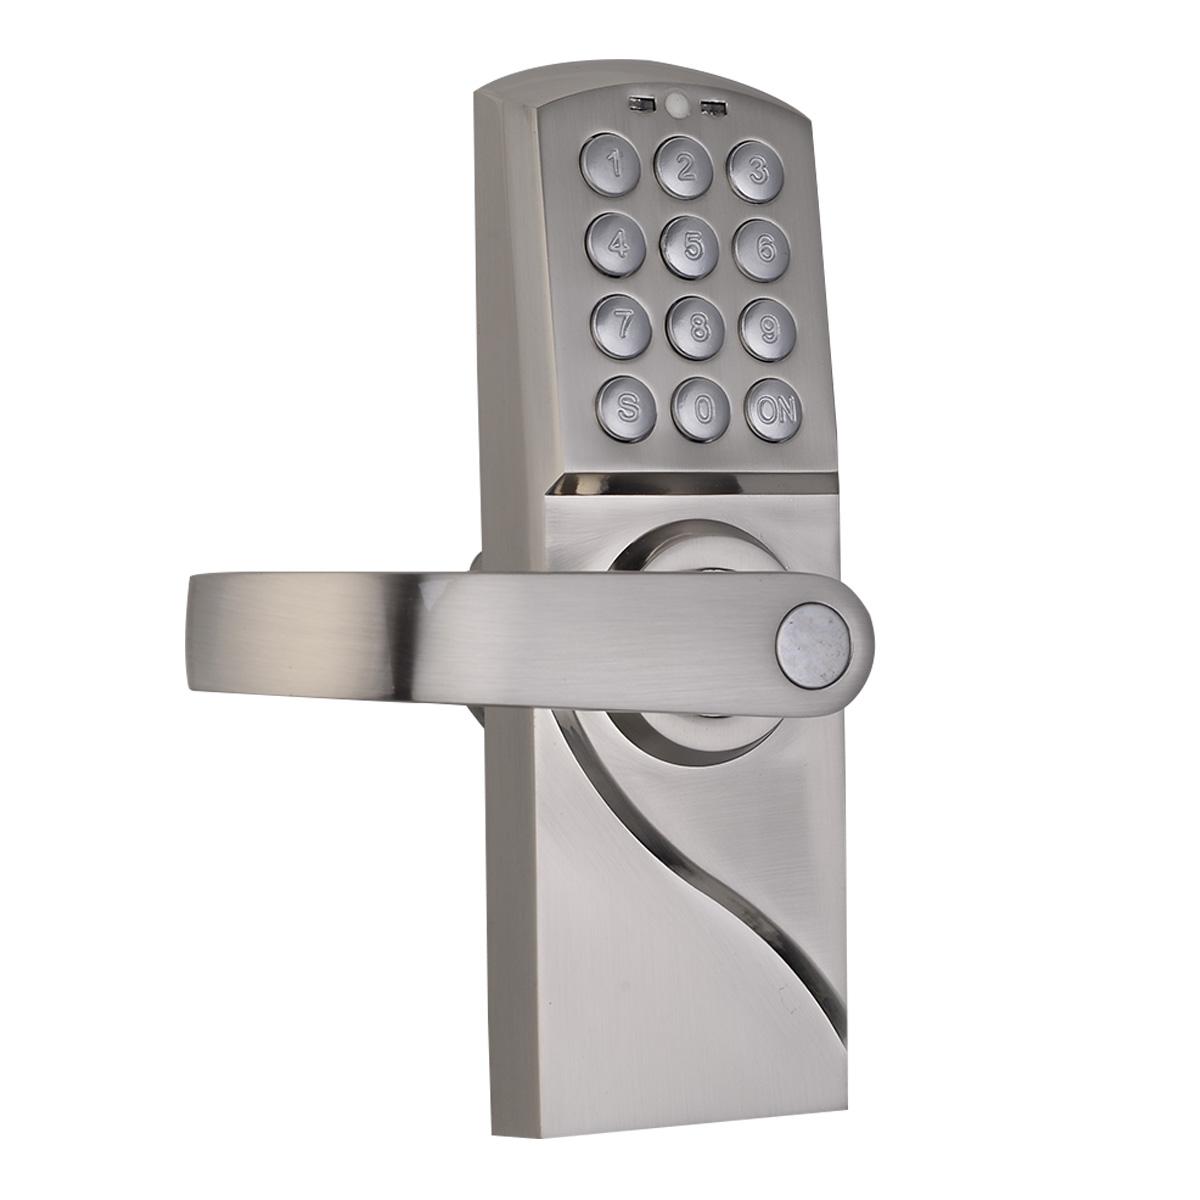 keyless door knob photo - 7